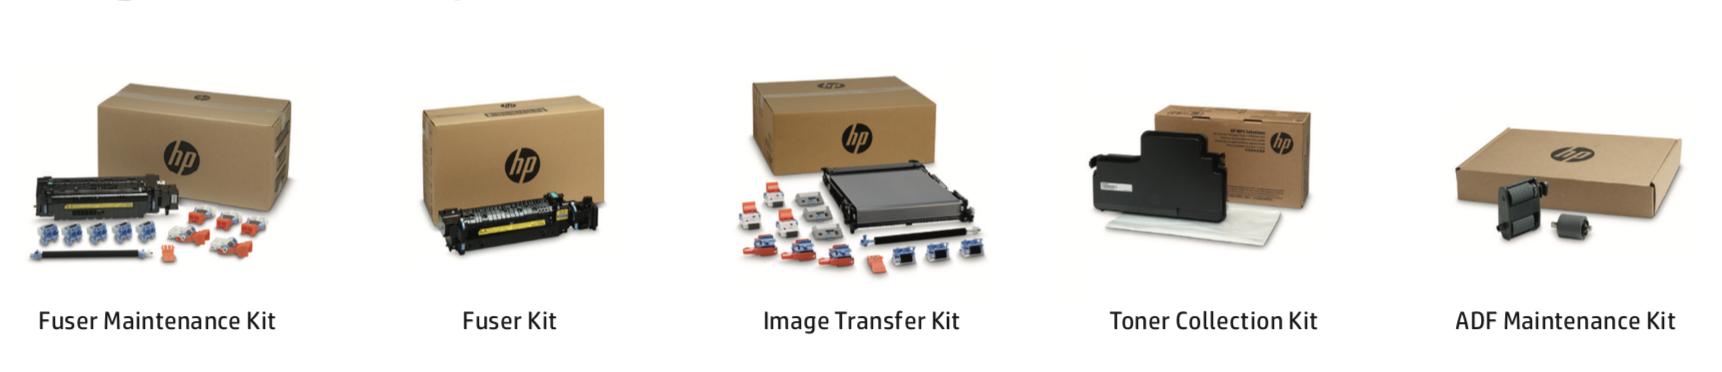 HP Kits